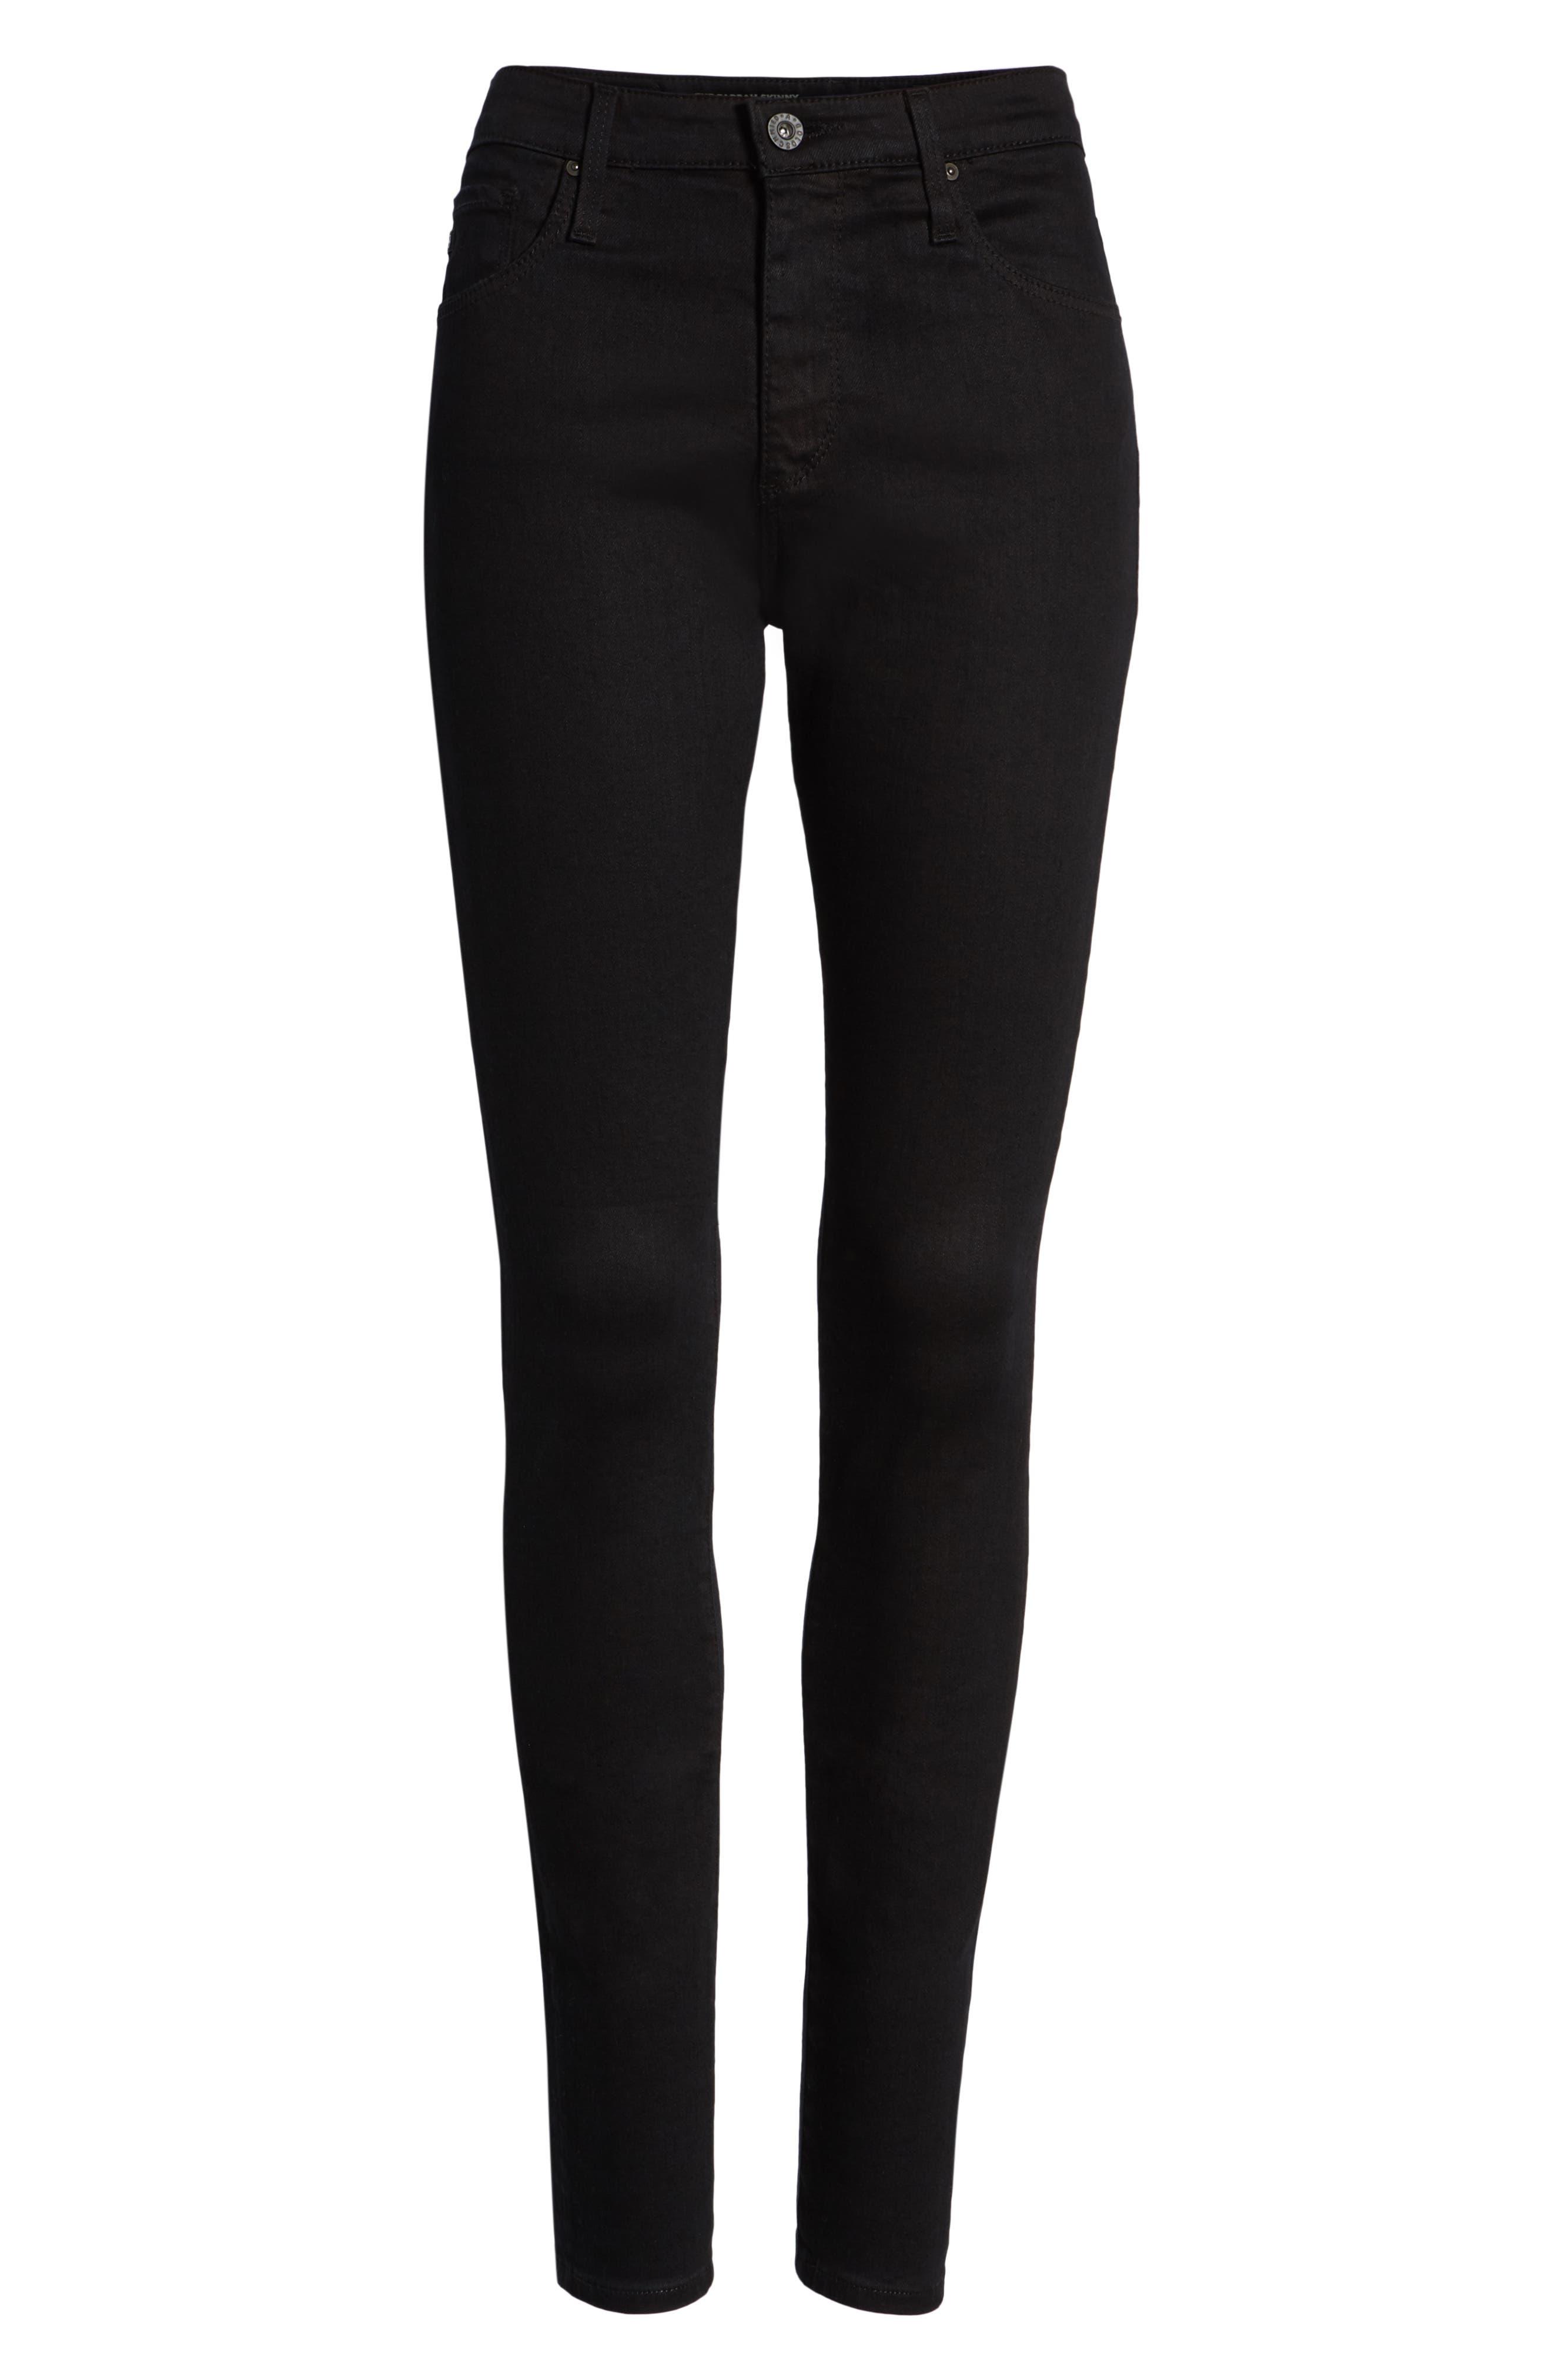 'The Farrah' High Rise Skinny Jeans,                             Alternate thumbnail 7, color,                             Overdyed Black